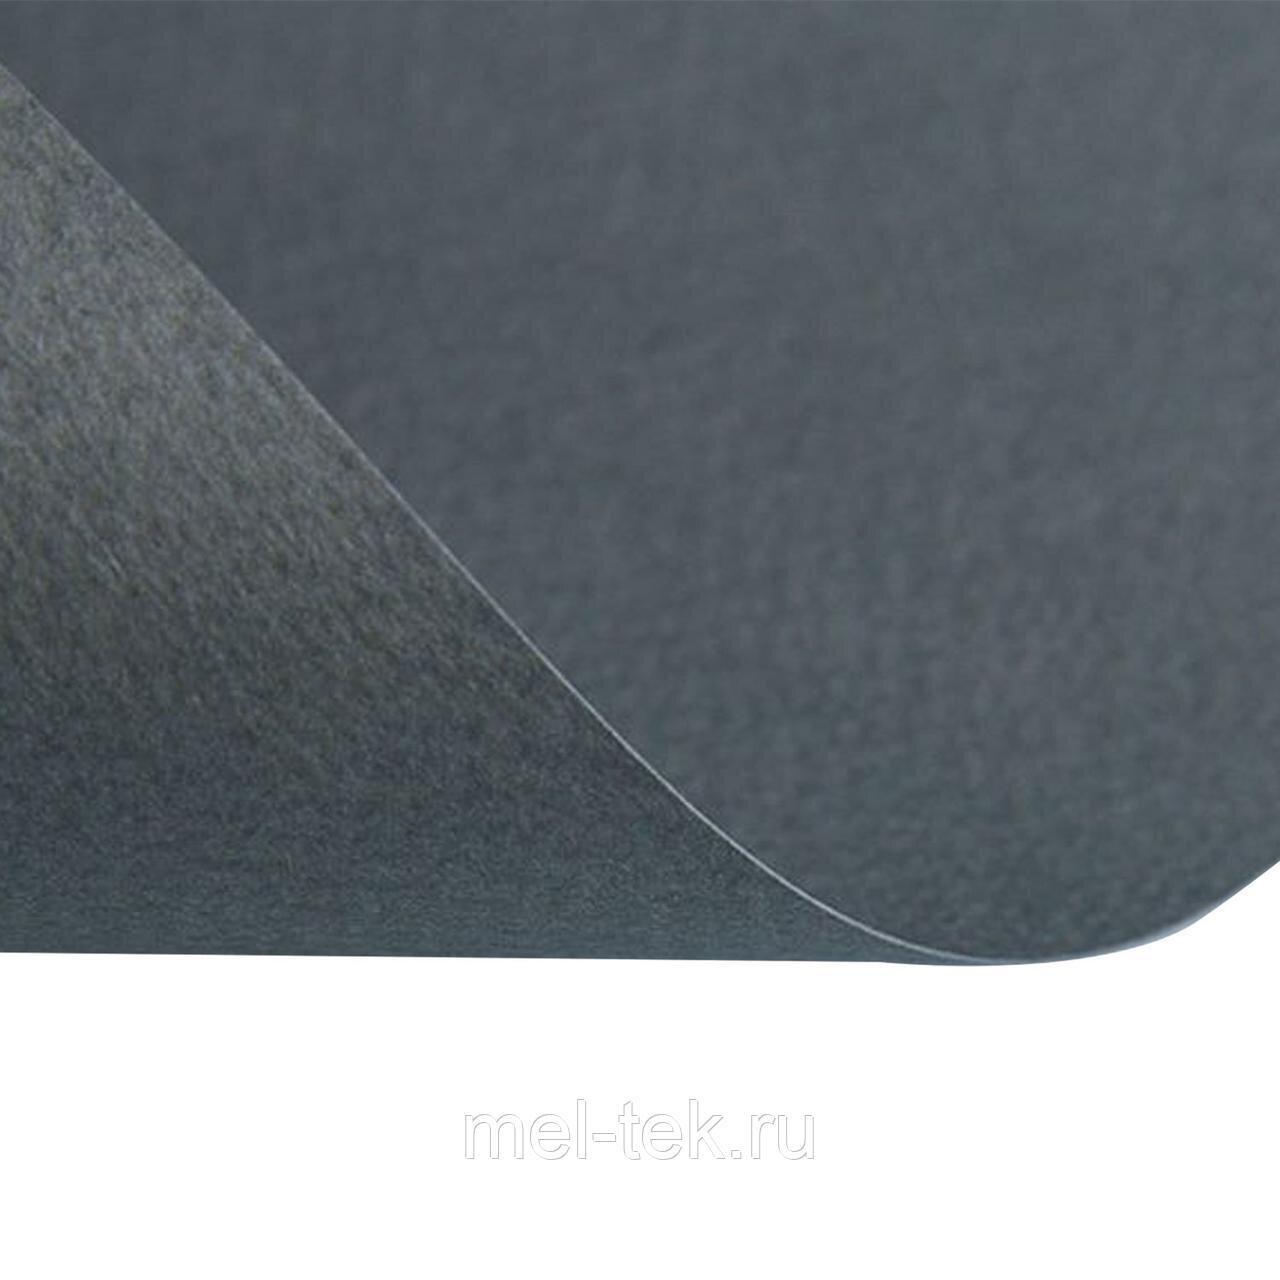 Бумага для пастели (1 лист) FABRIANO Tiziano А2+ (500х650 мм), 160 г/м2, антрацит.